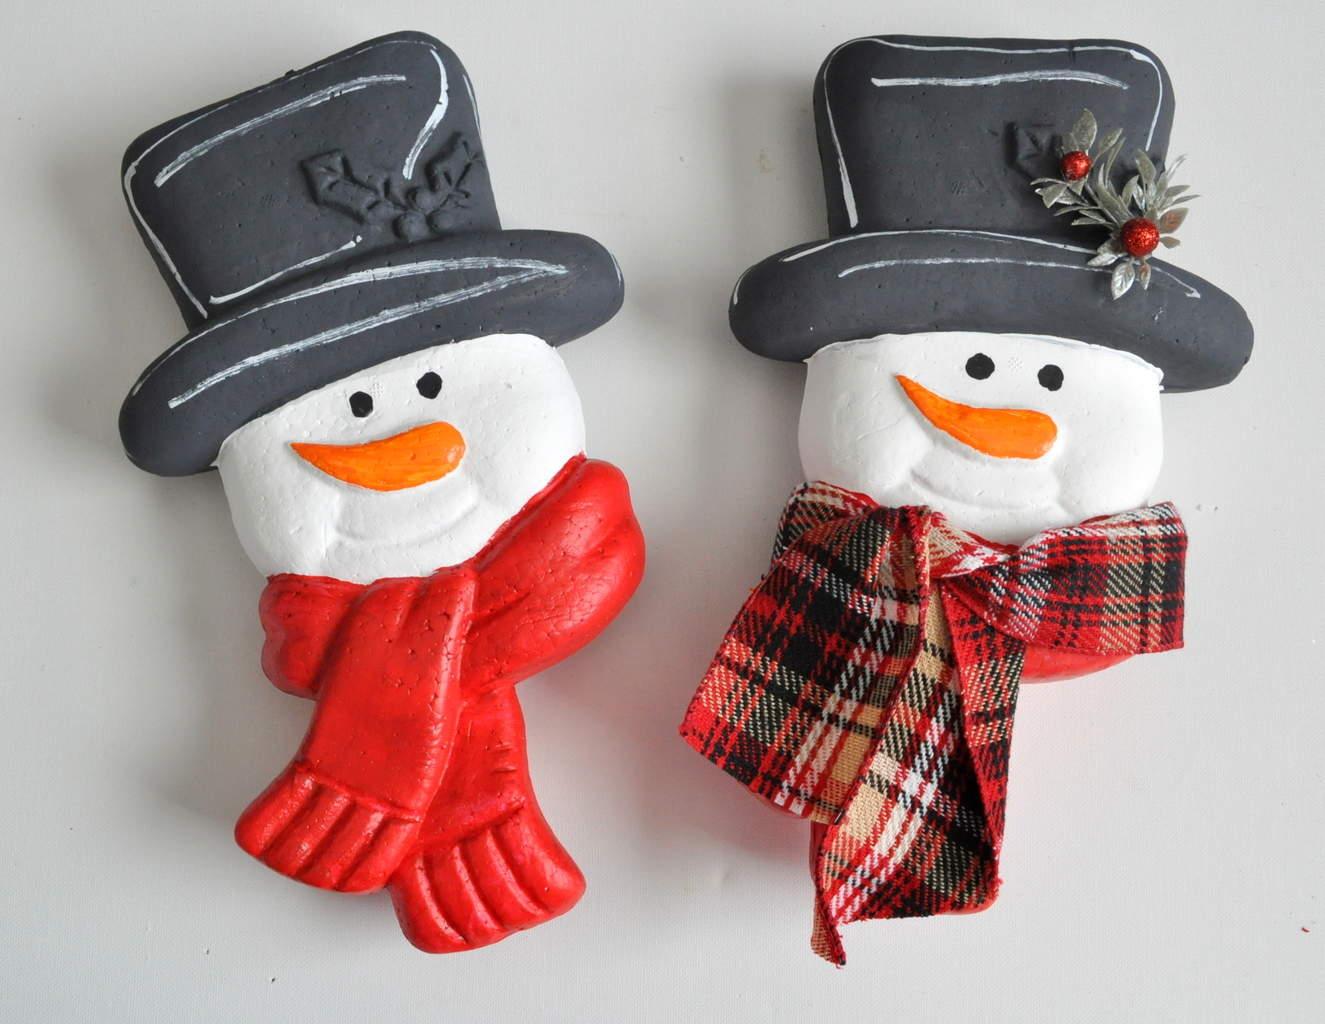 Embellishing foam snowman ornaments